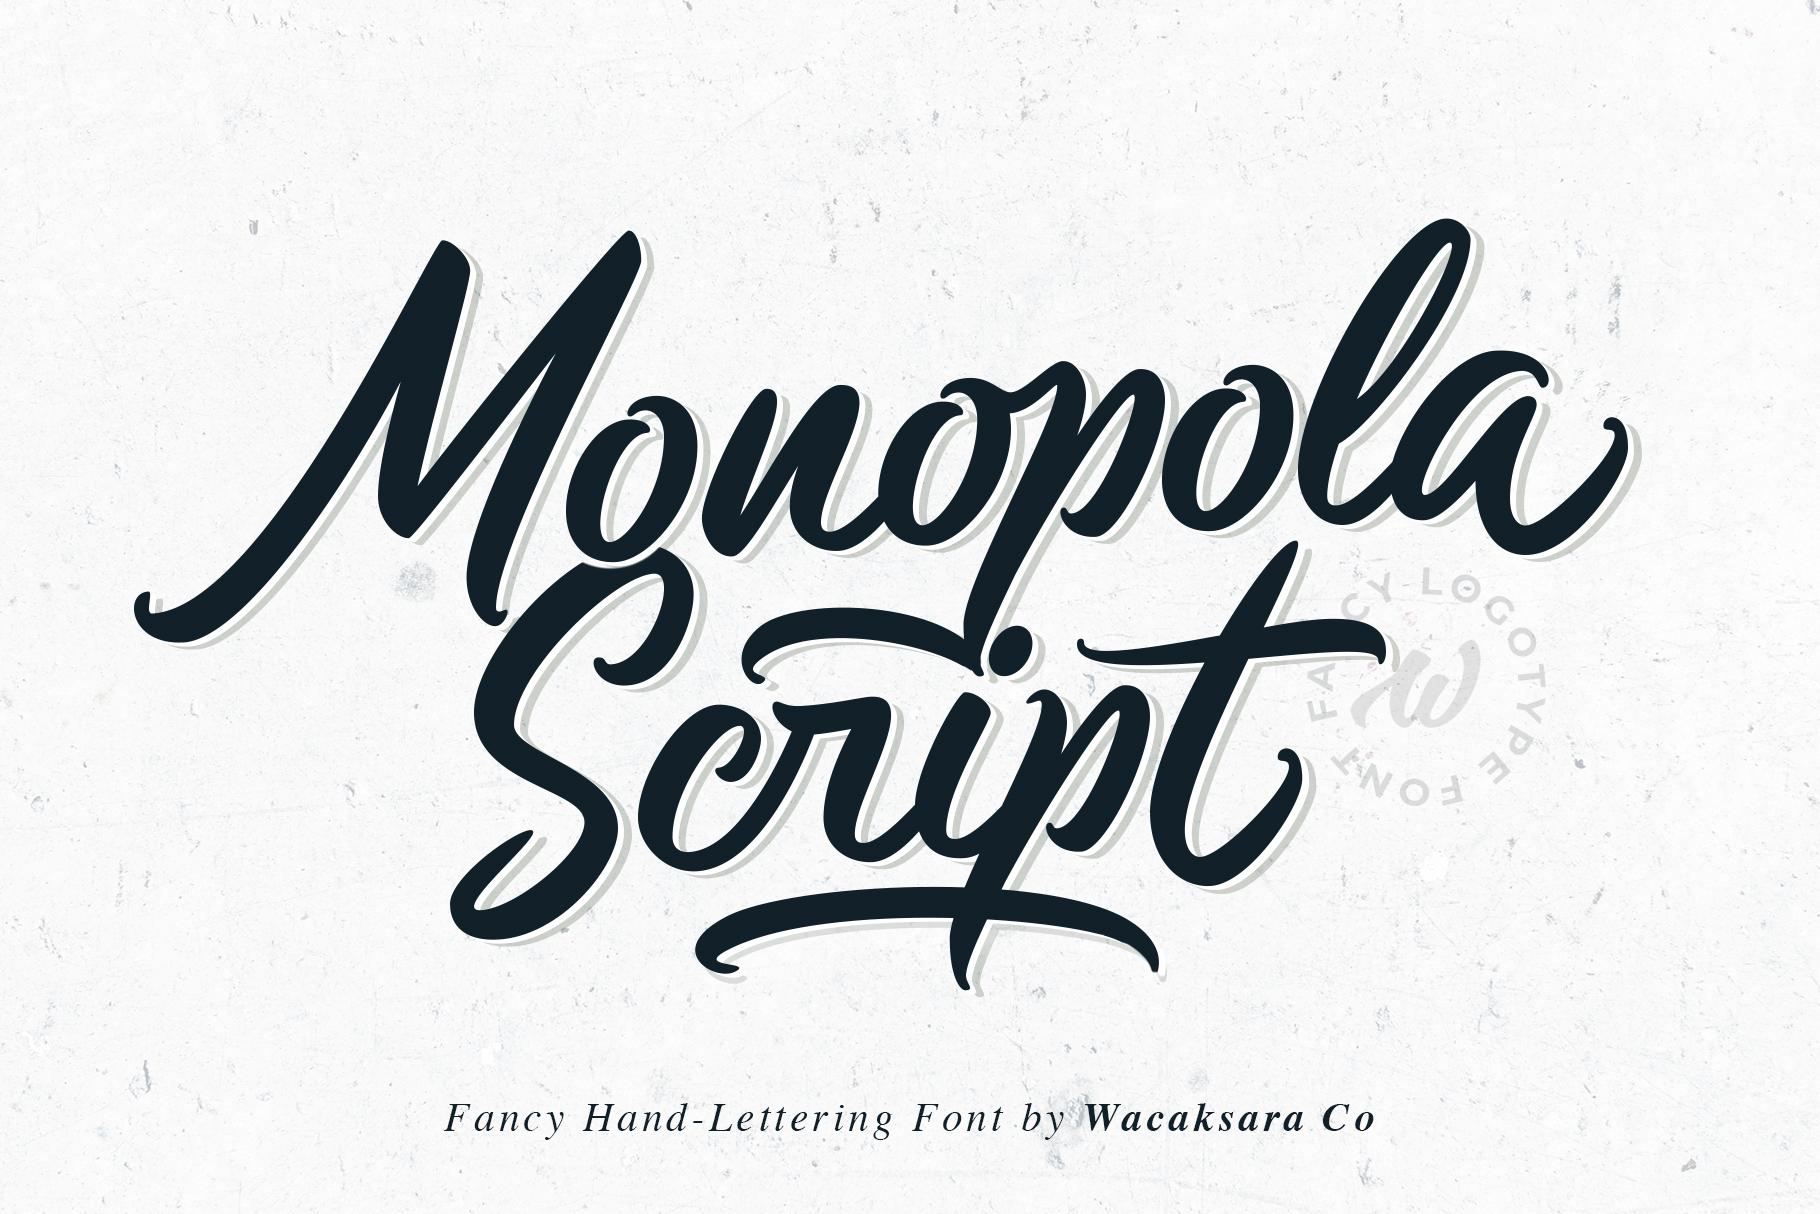 Monopola Script example image 1